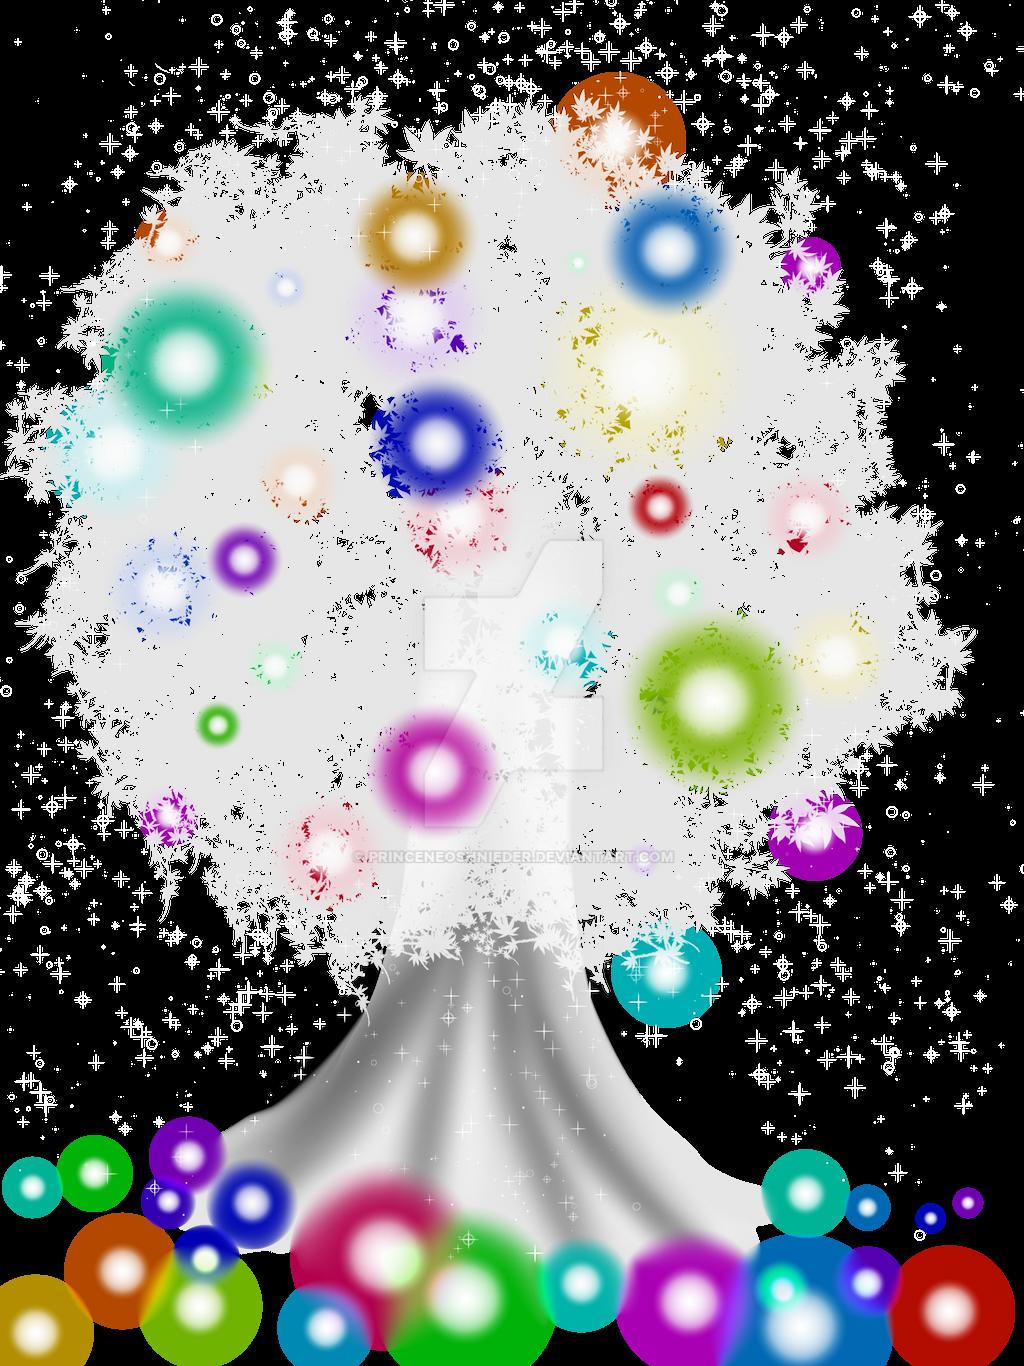 Soul Tree by PrinceNeoShnieder